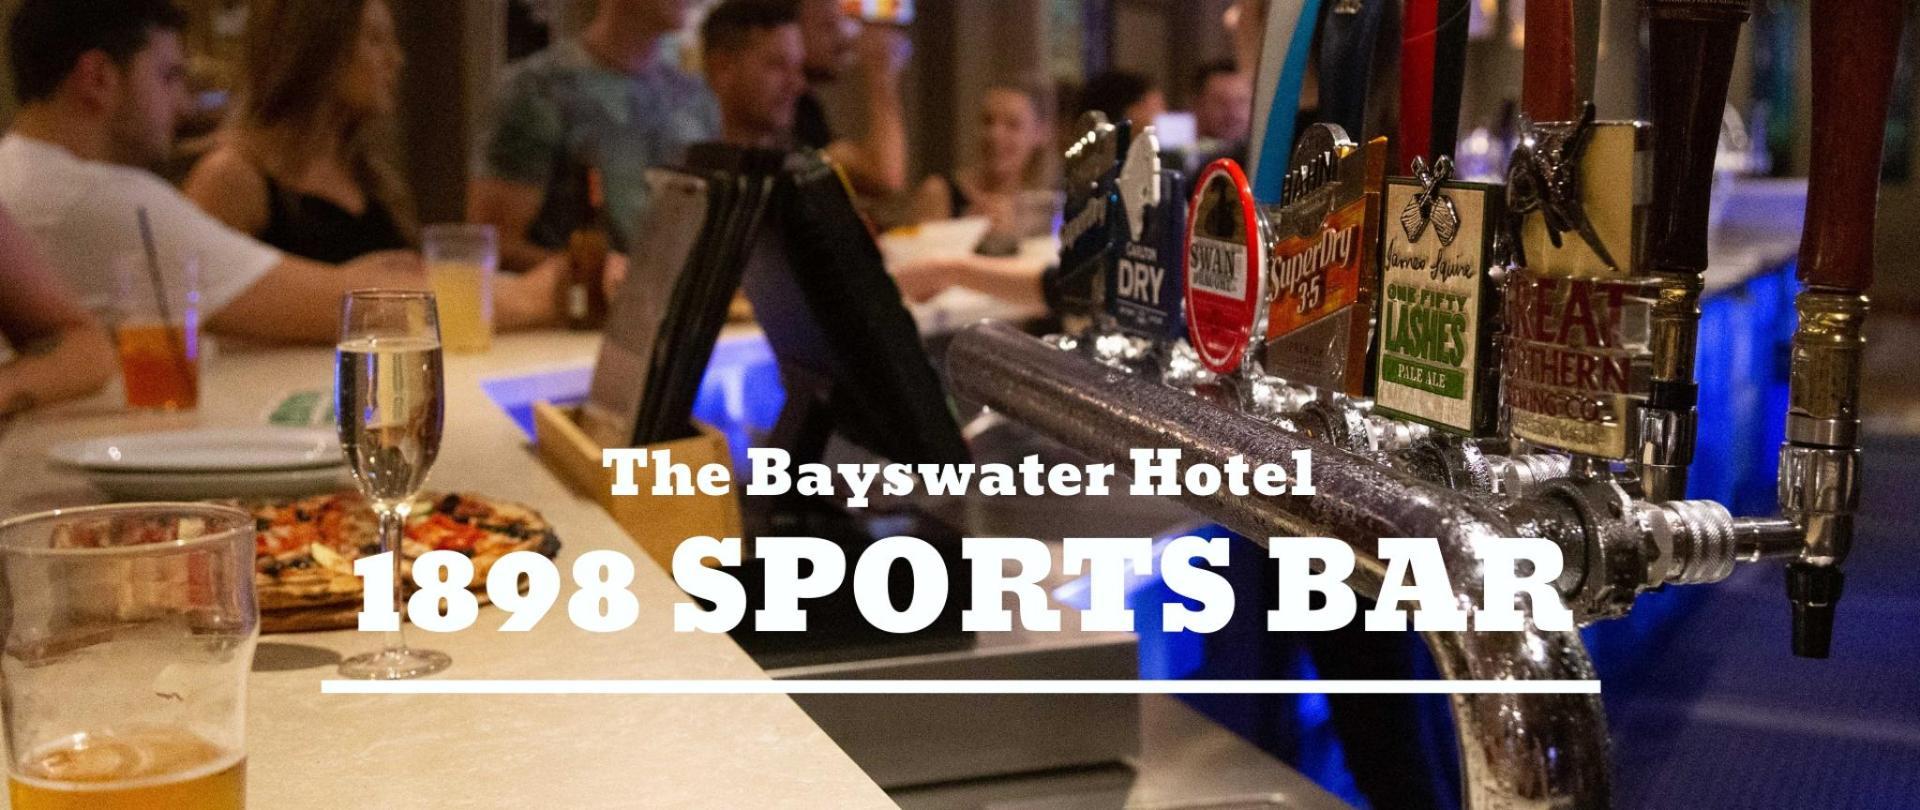 5. 1898 Sports Bar.jpg